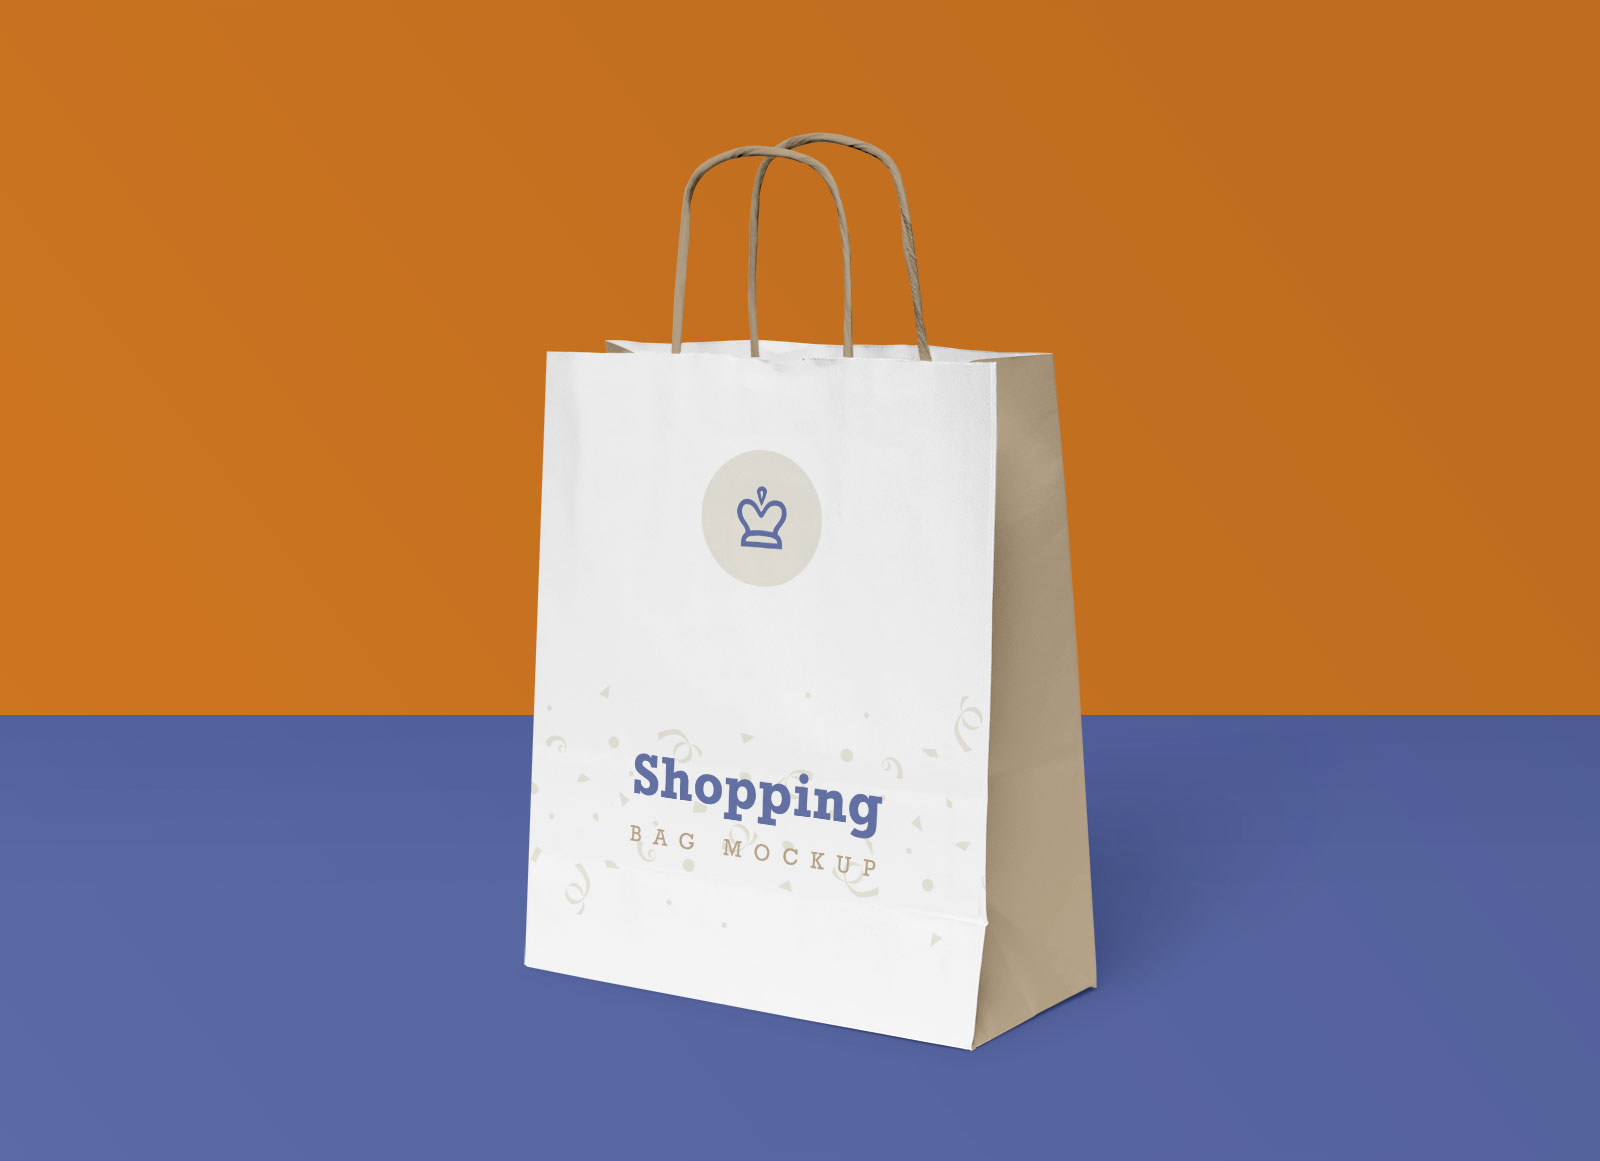 Free-White-Shopping-Bag-Mockup-PSD